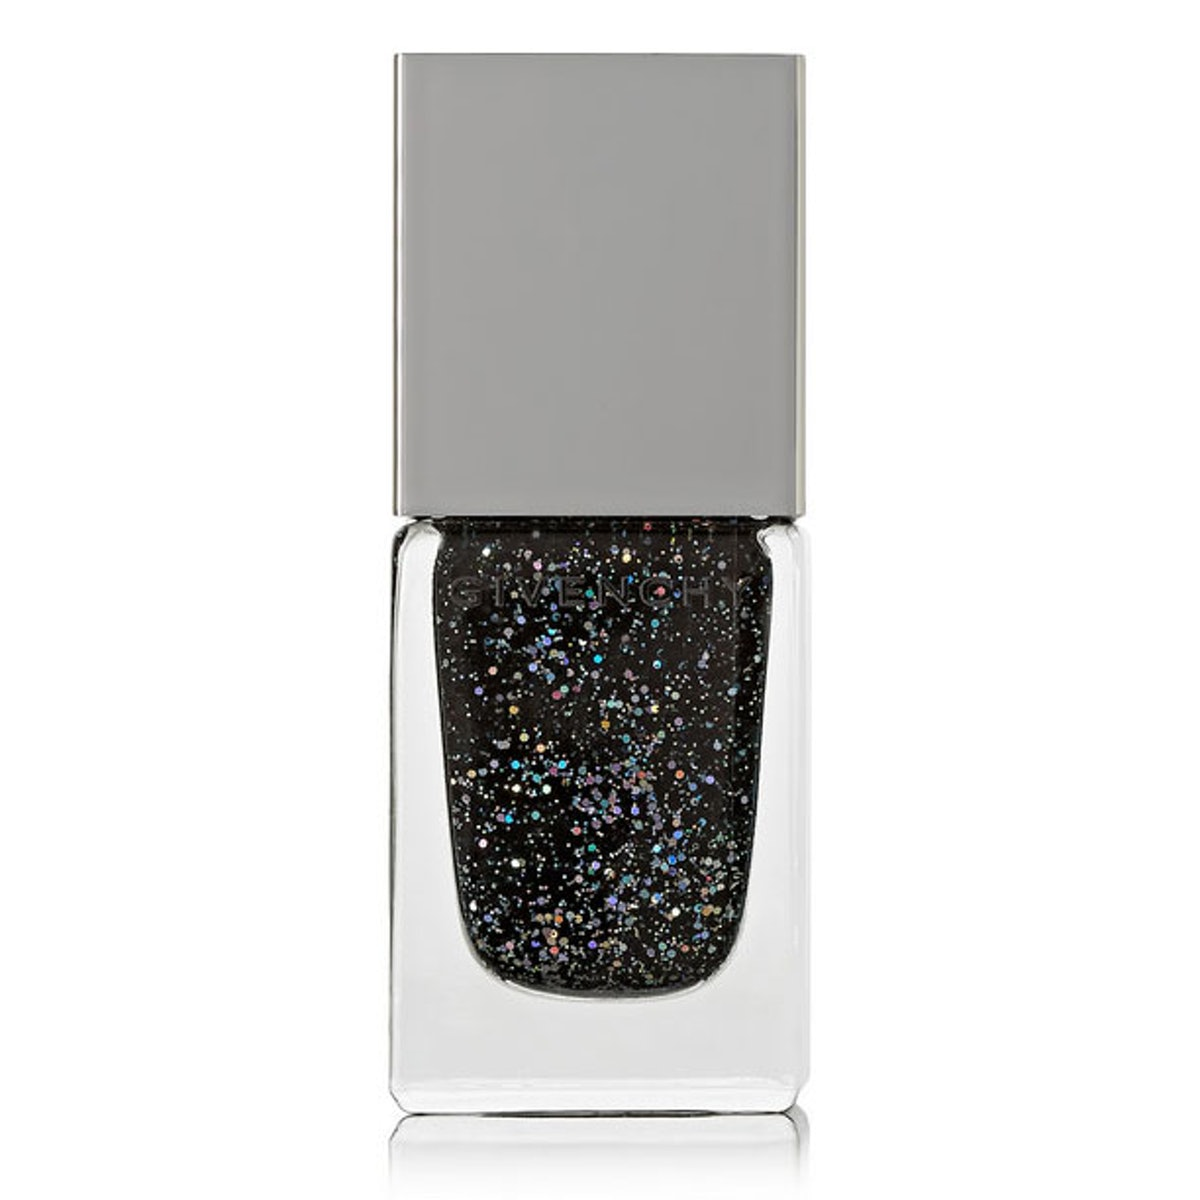 Givenchy Beauty Nail Polish in Folie Scintillante